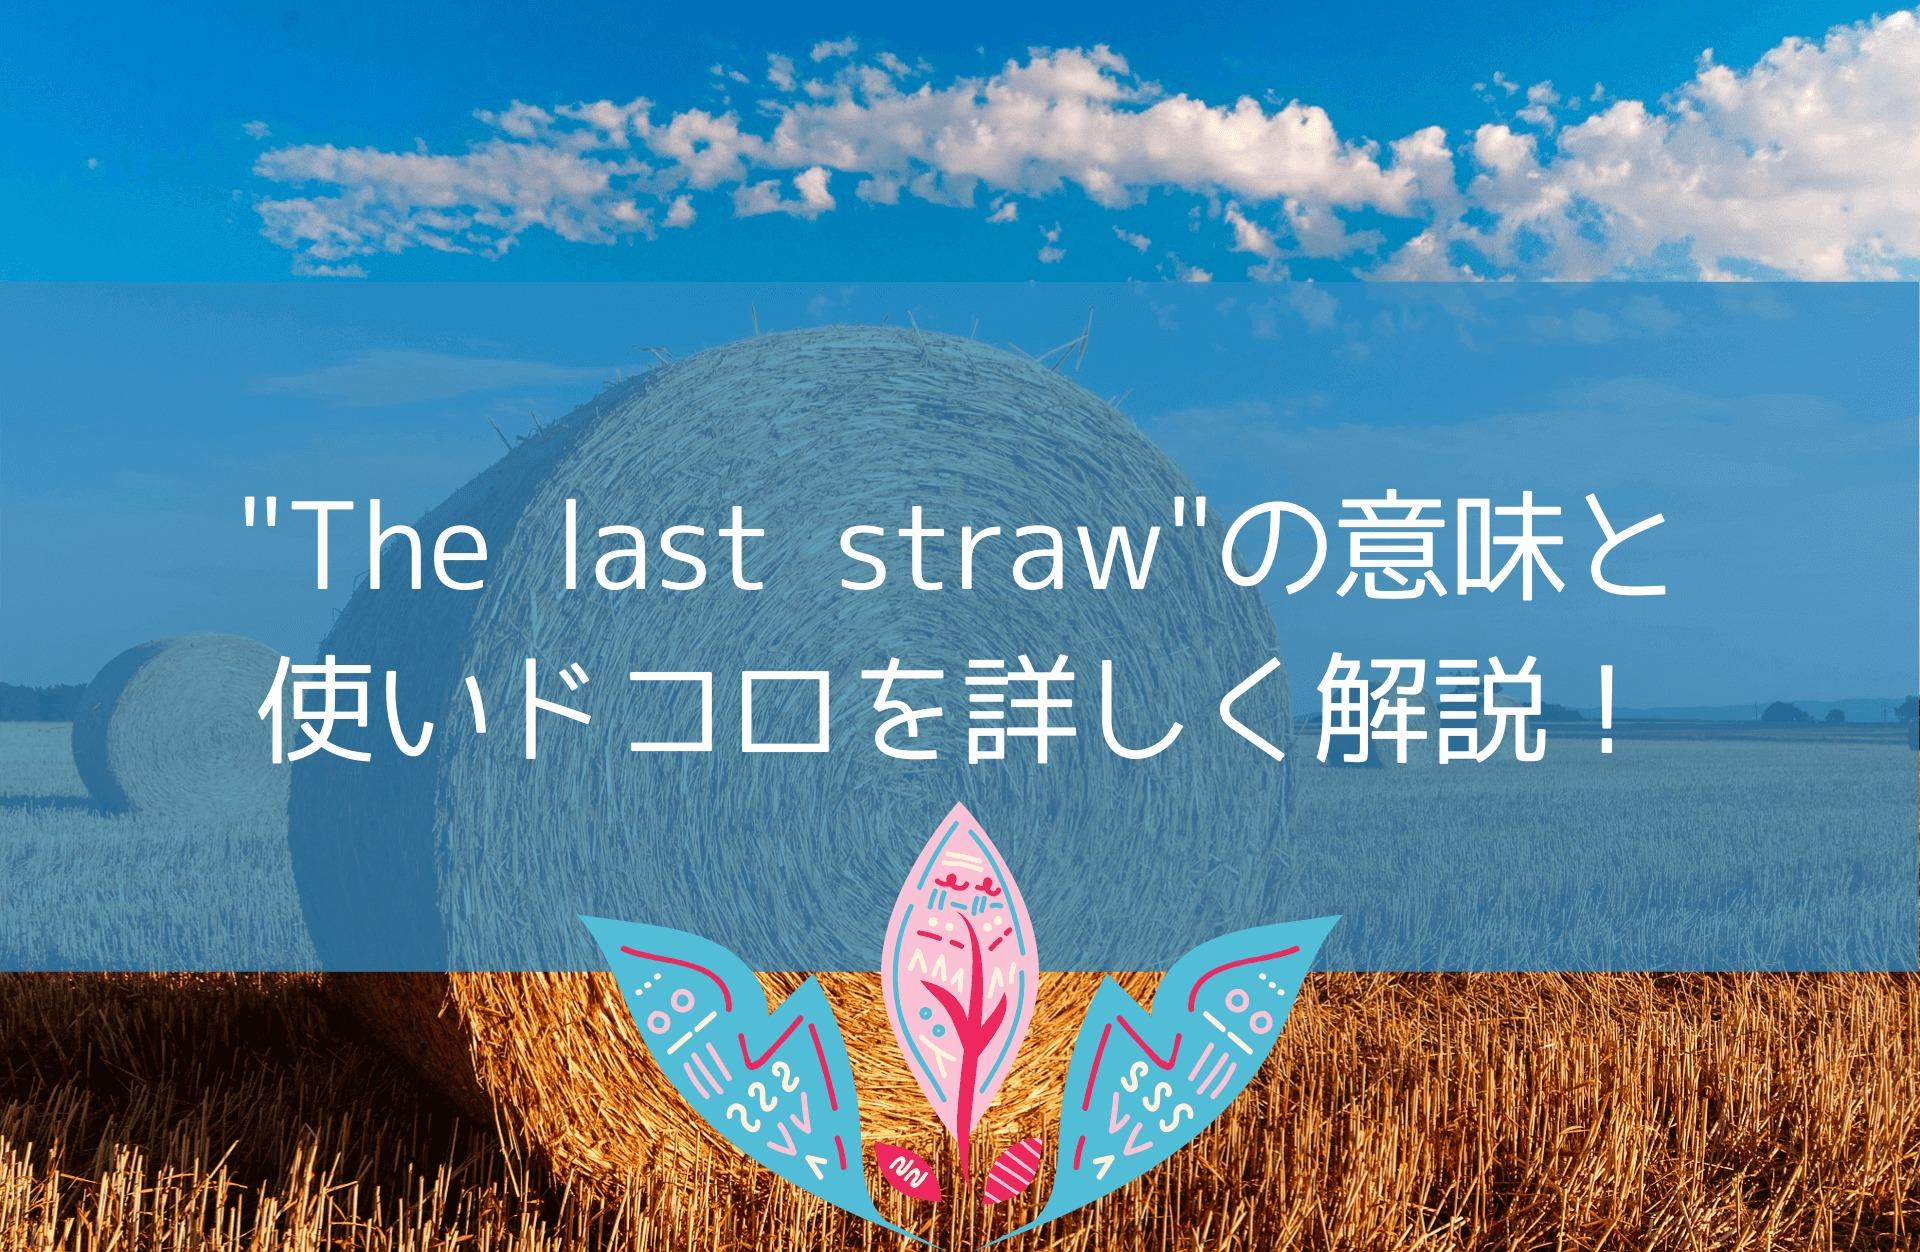 The last strawの意味と使いドコロを詳しく解説!